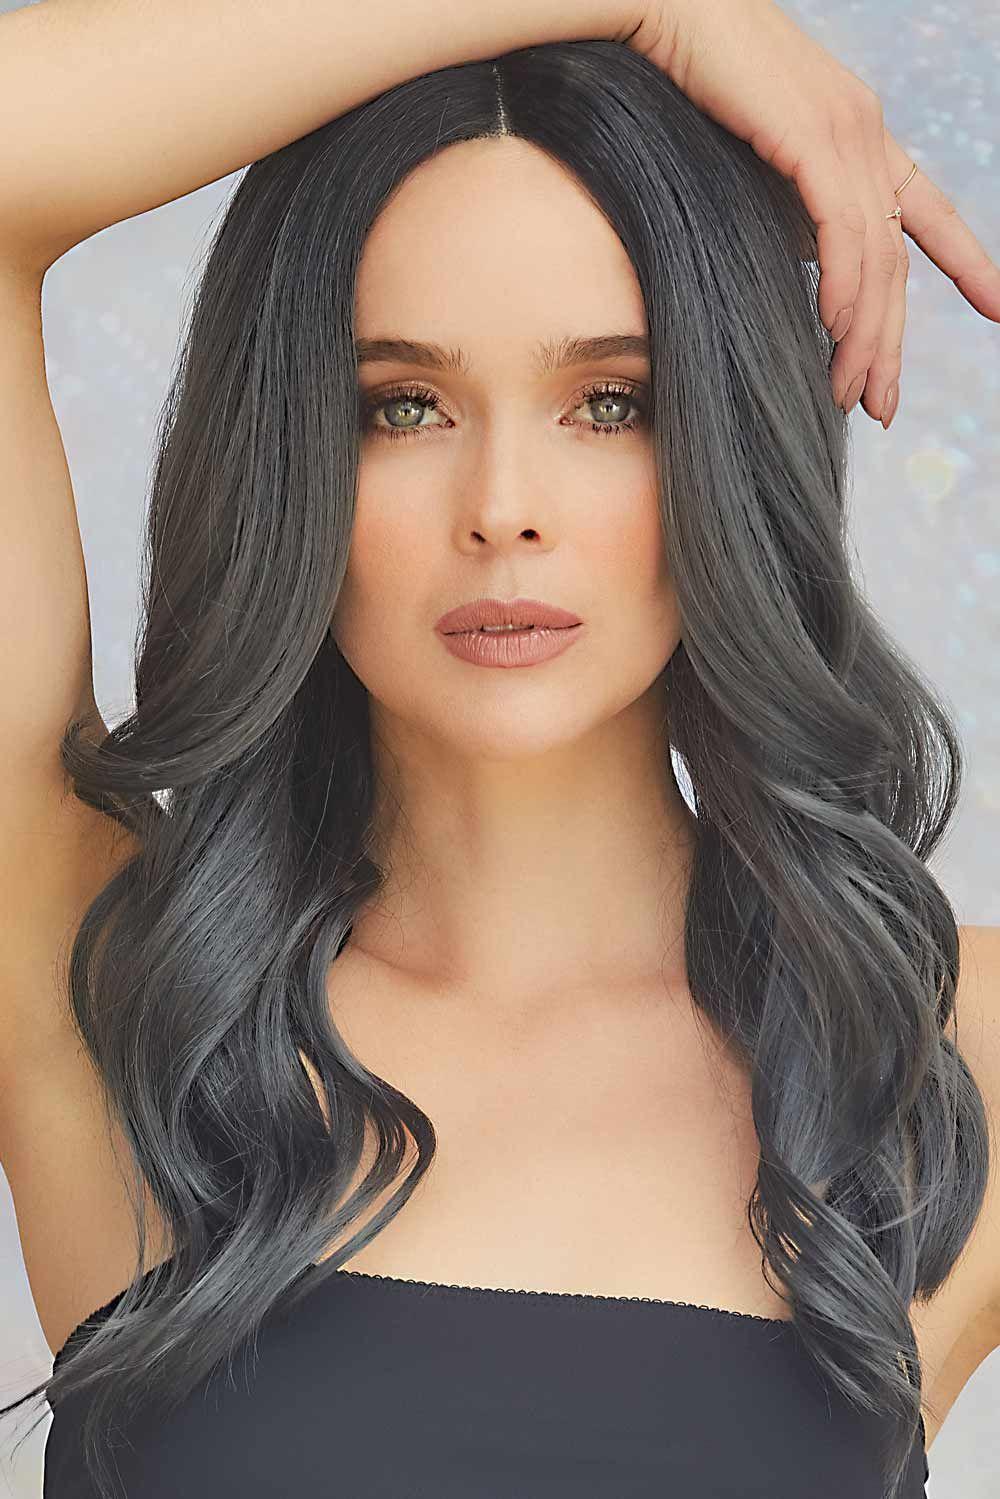 Divine Wavez by Rene of Paris Wigs - Smokey Black wig color